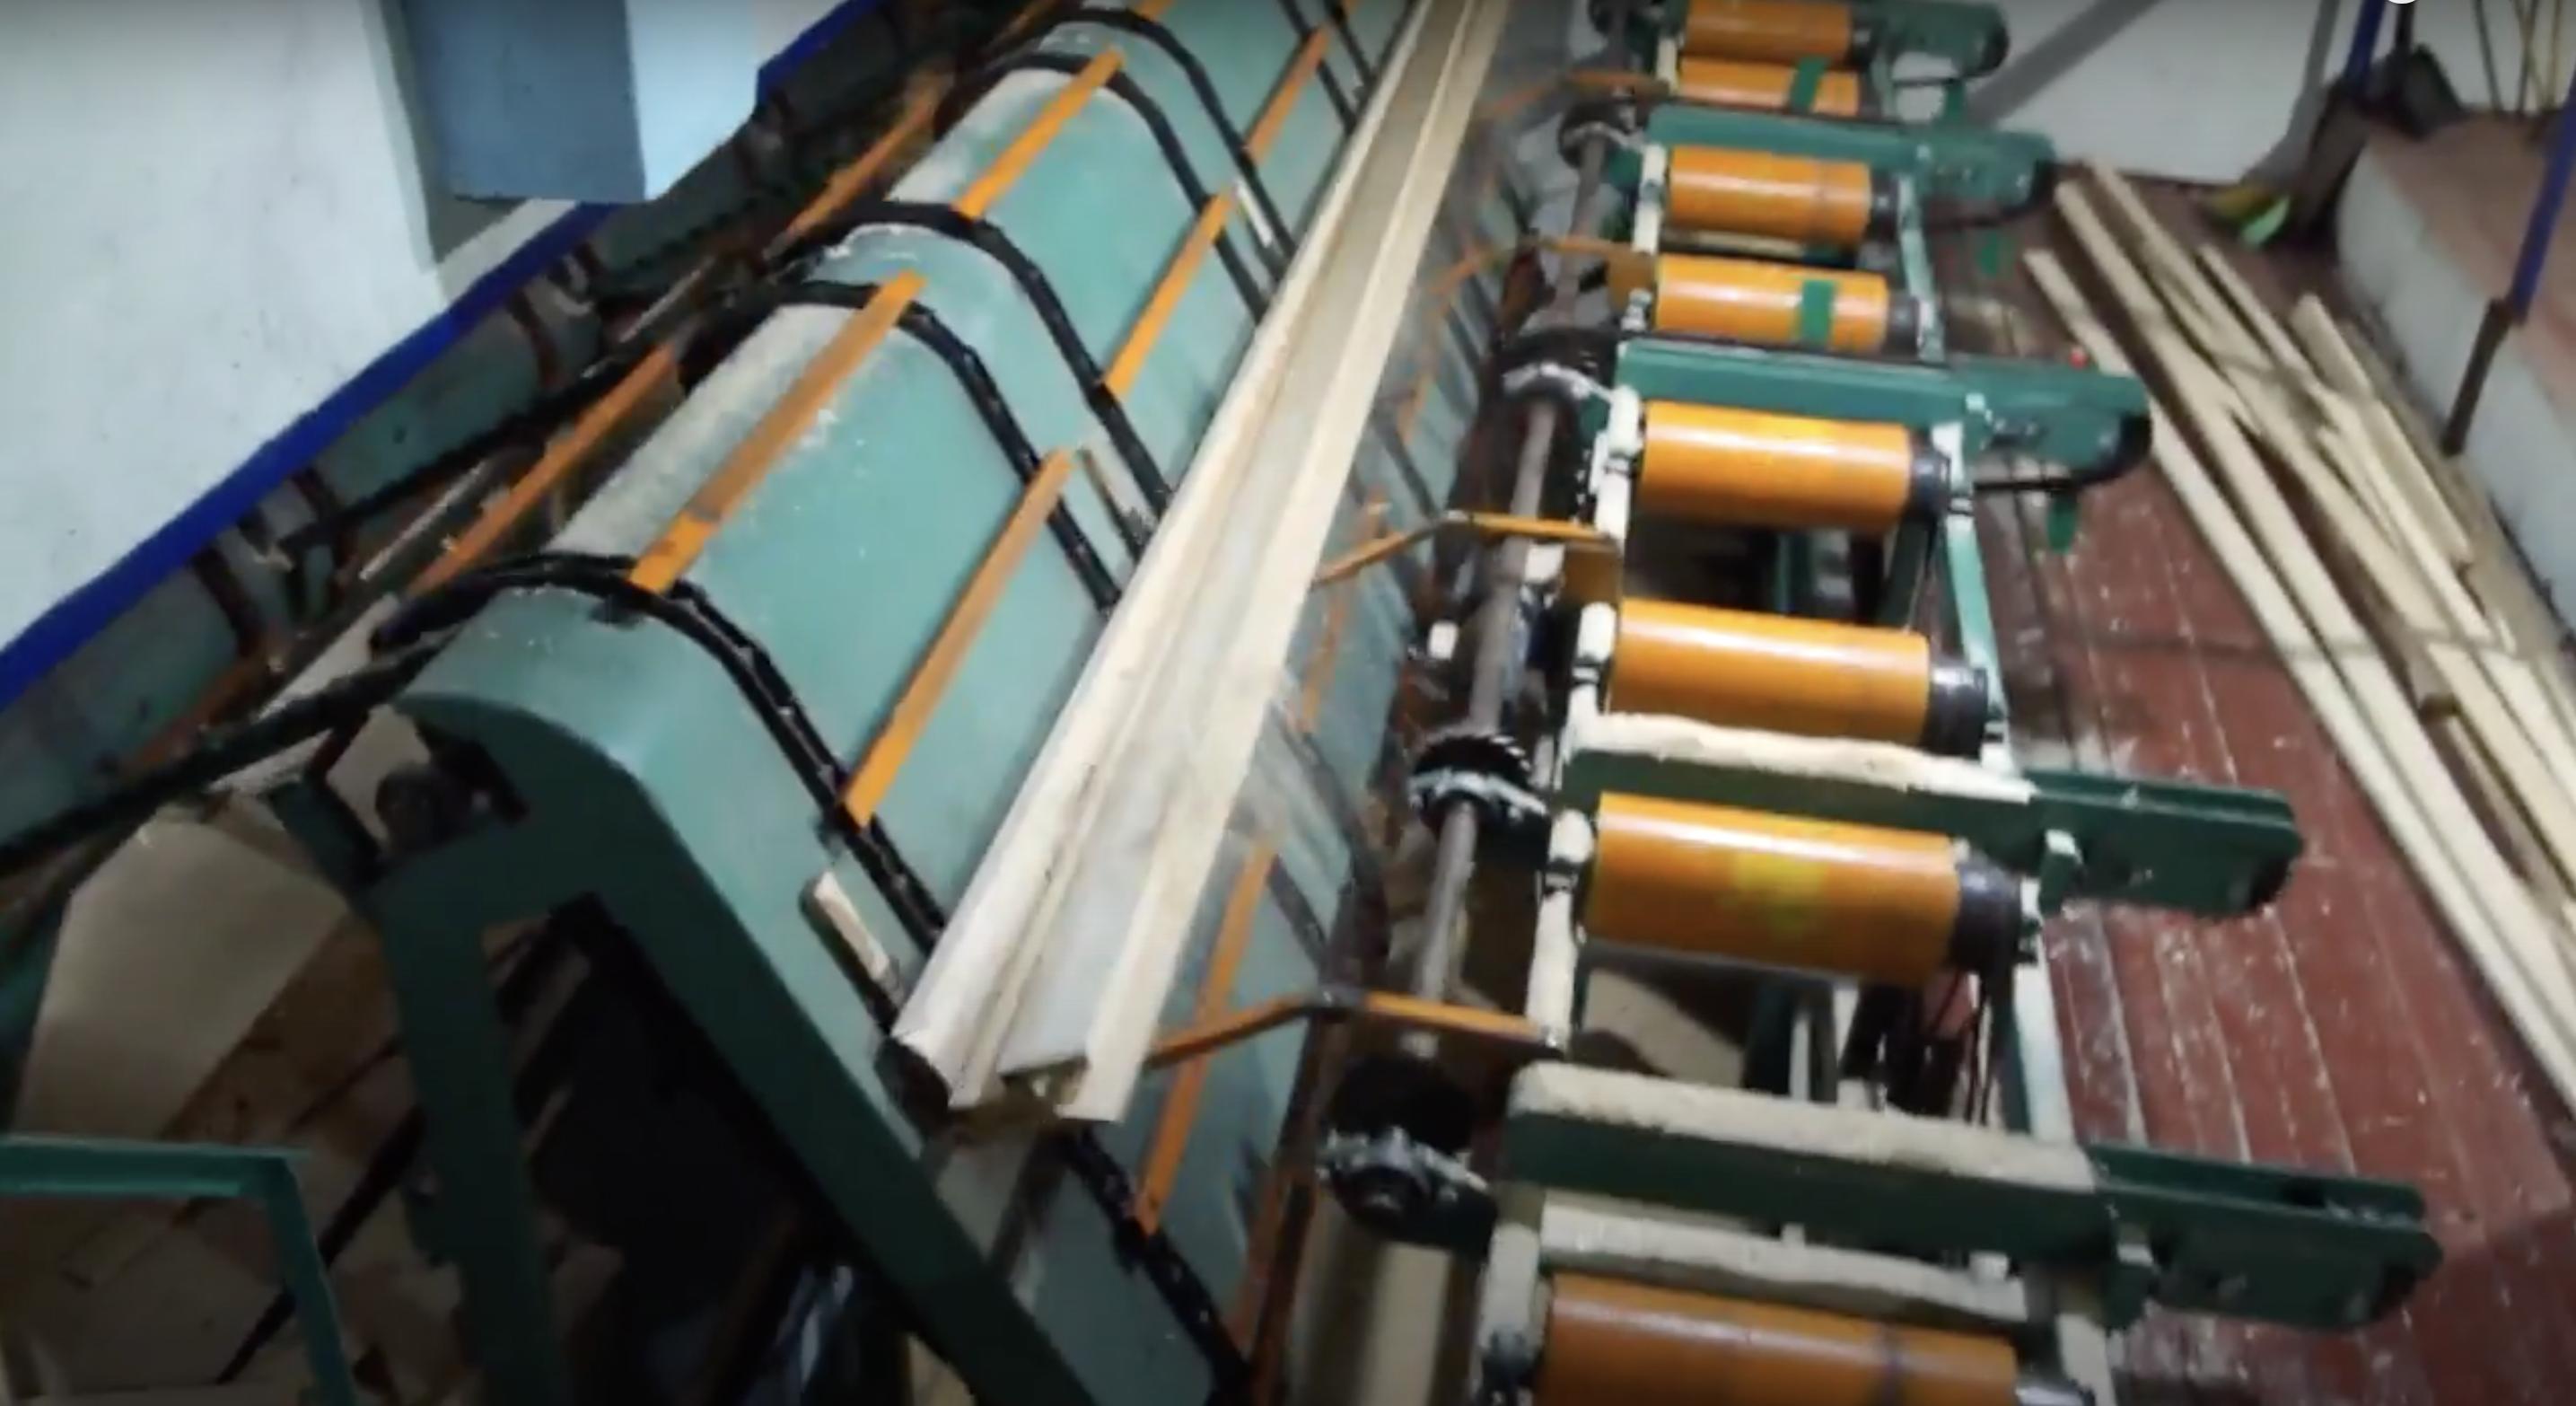 Board splitter slide